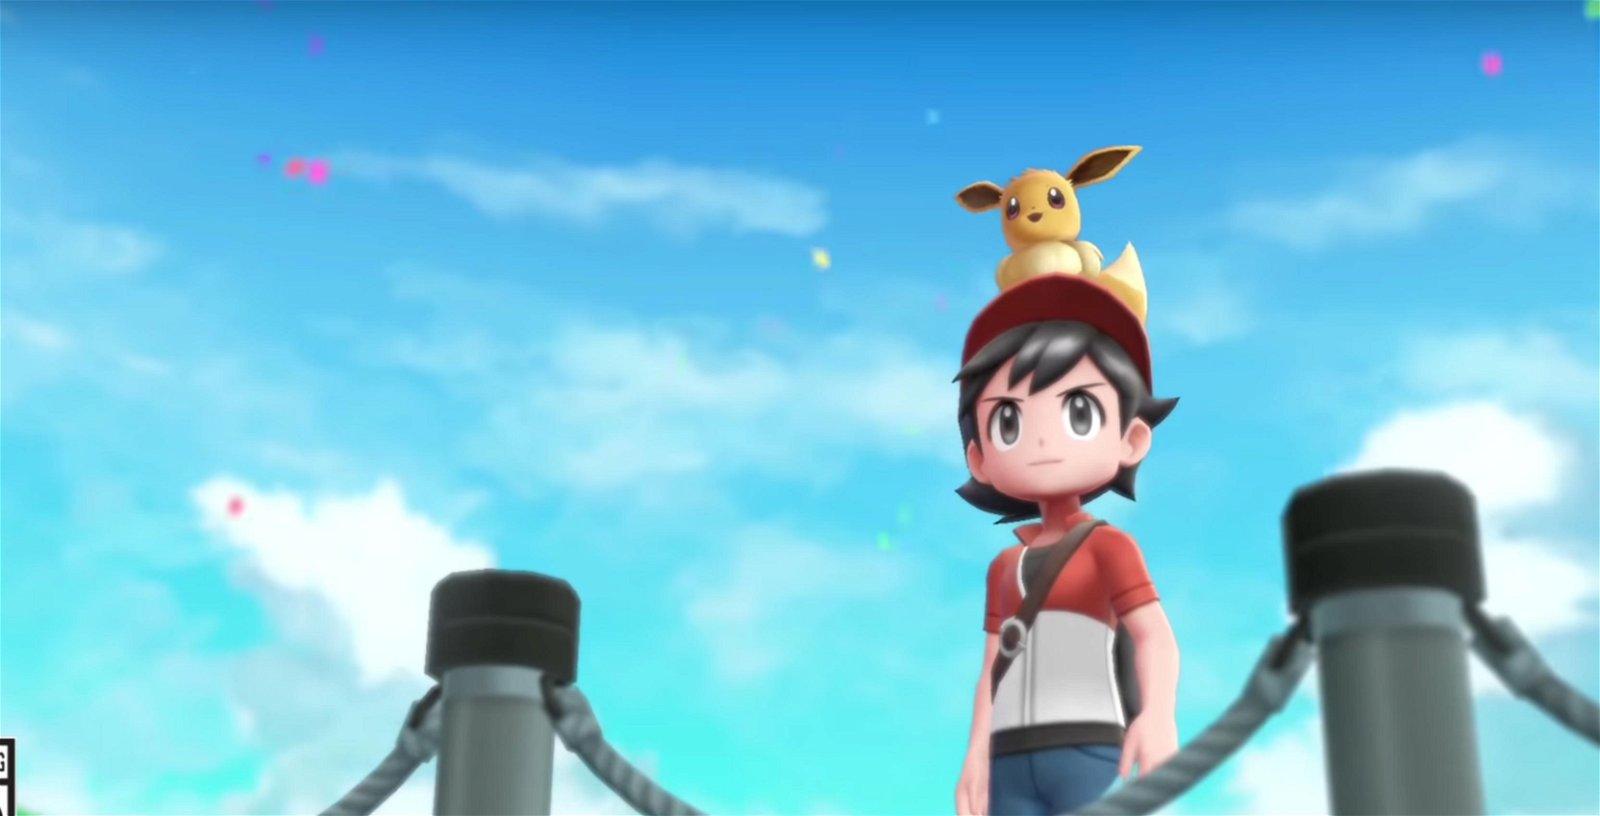 Pokémon Let's GO Pikachu!/Eevee! 3